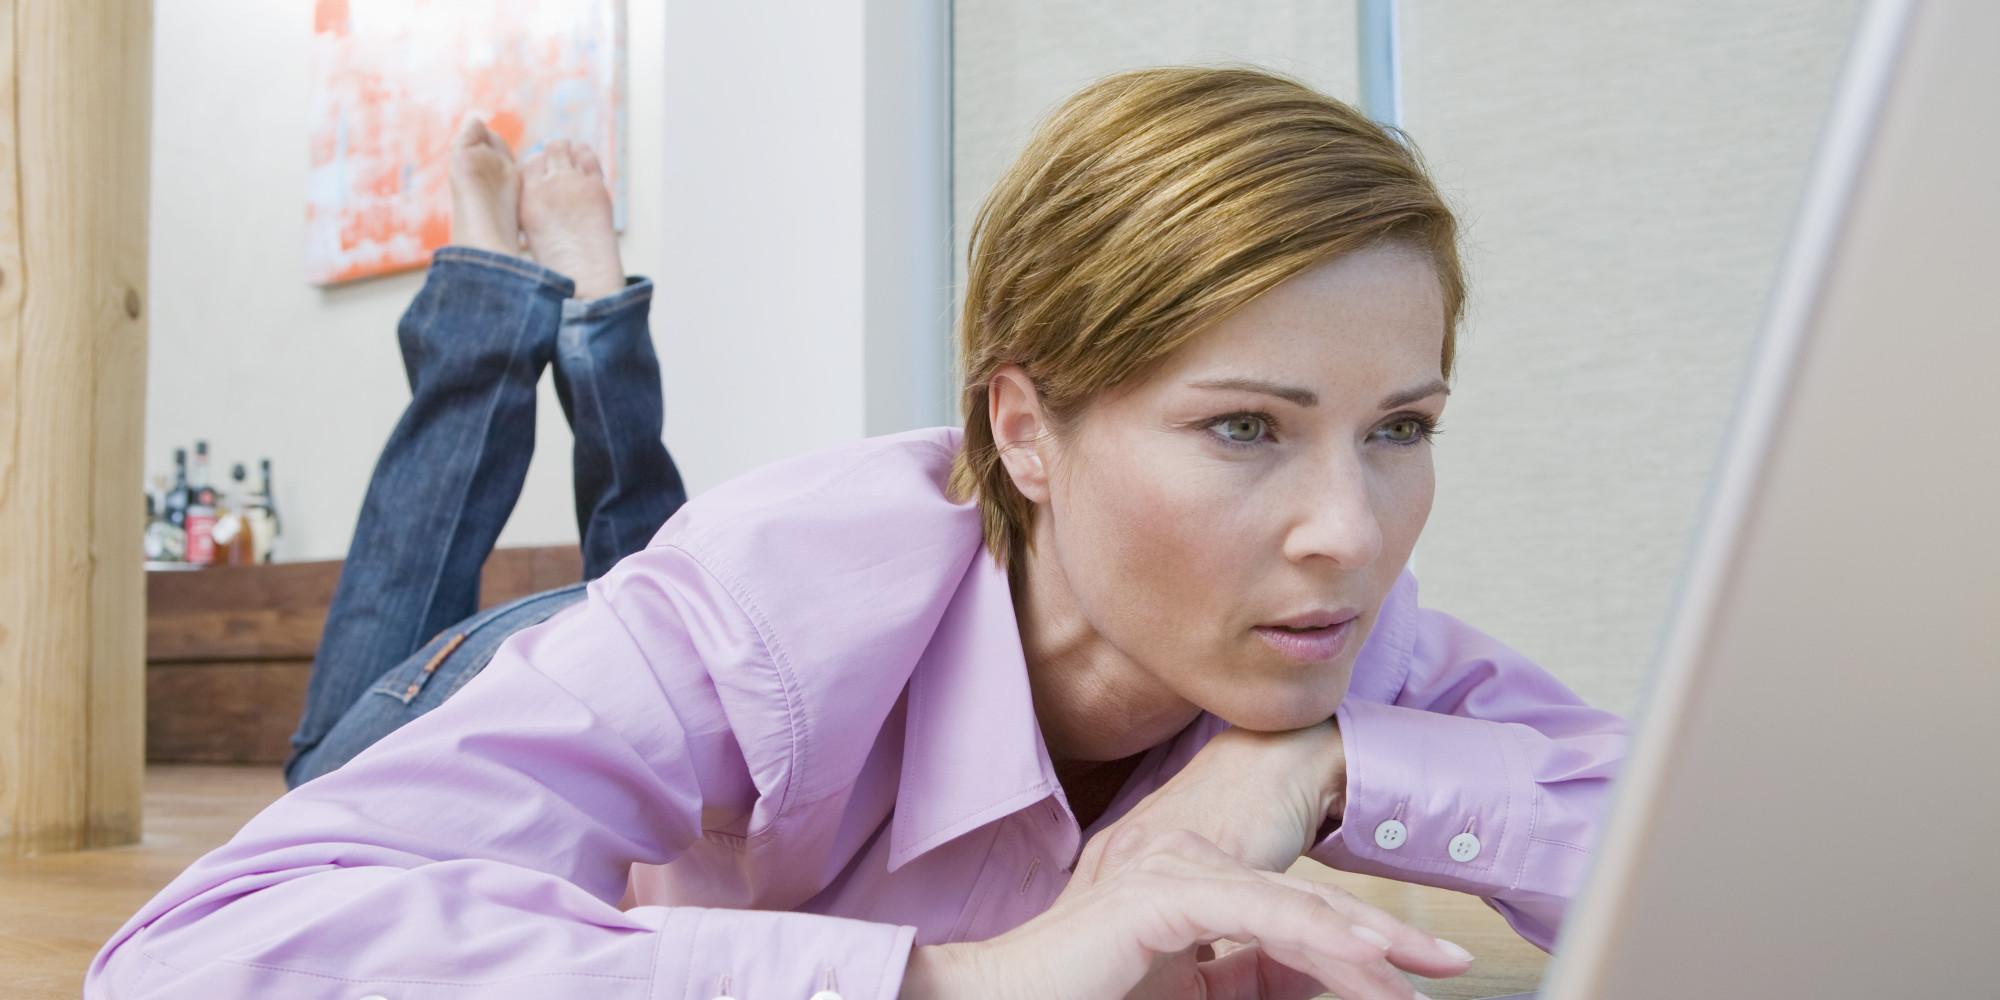 Mature Women Masturbating While On Computers 105